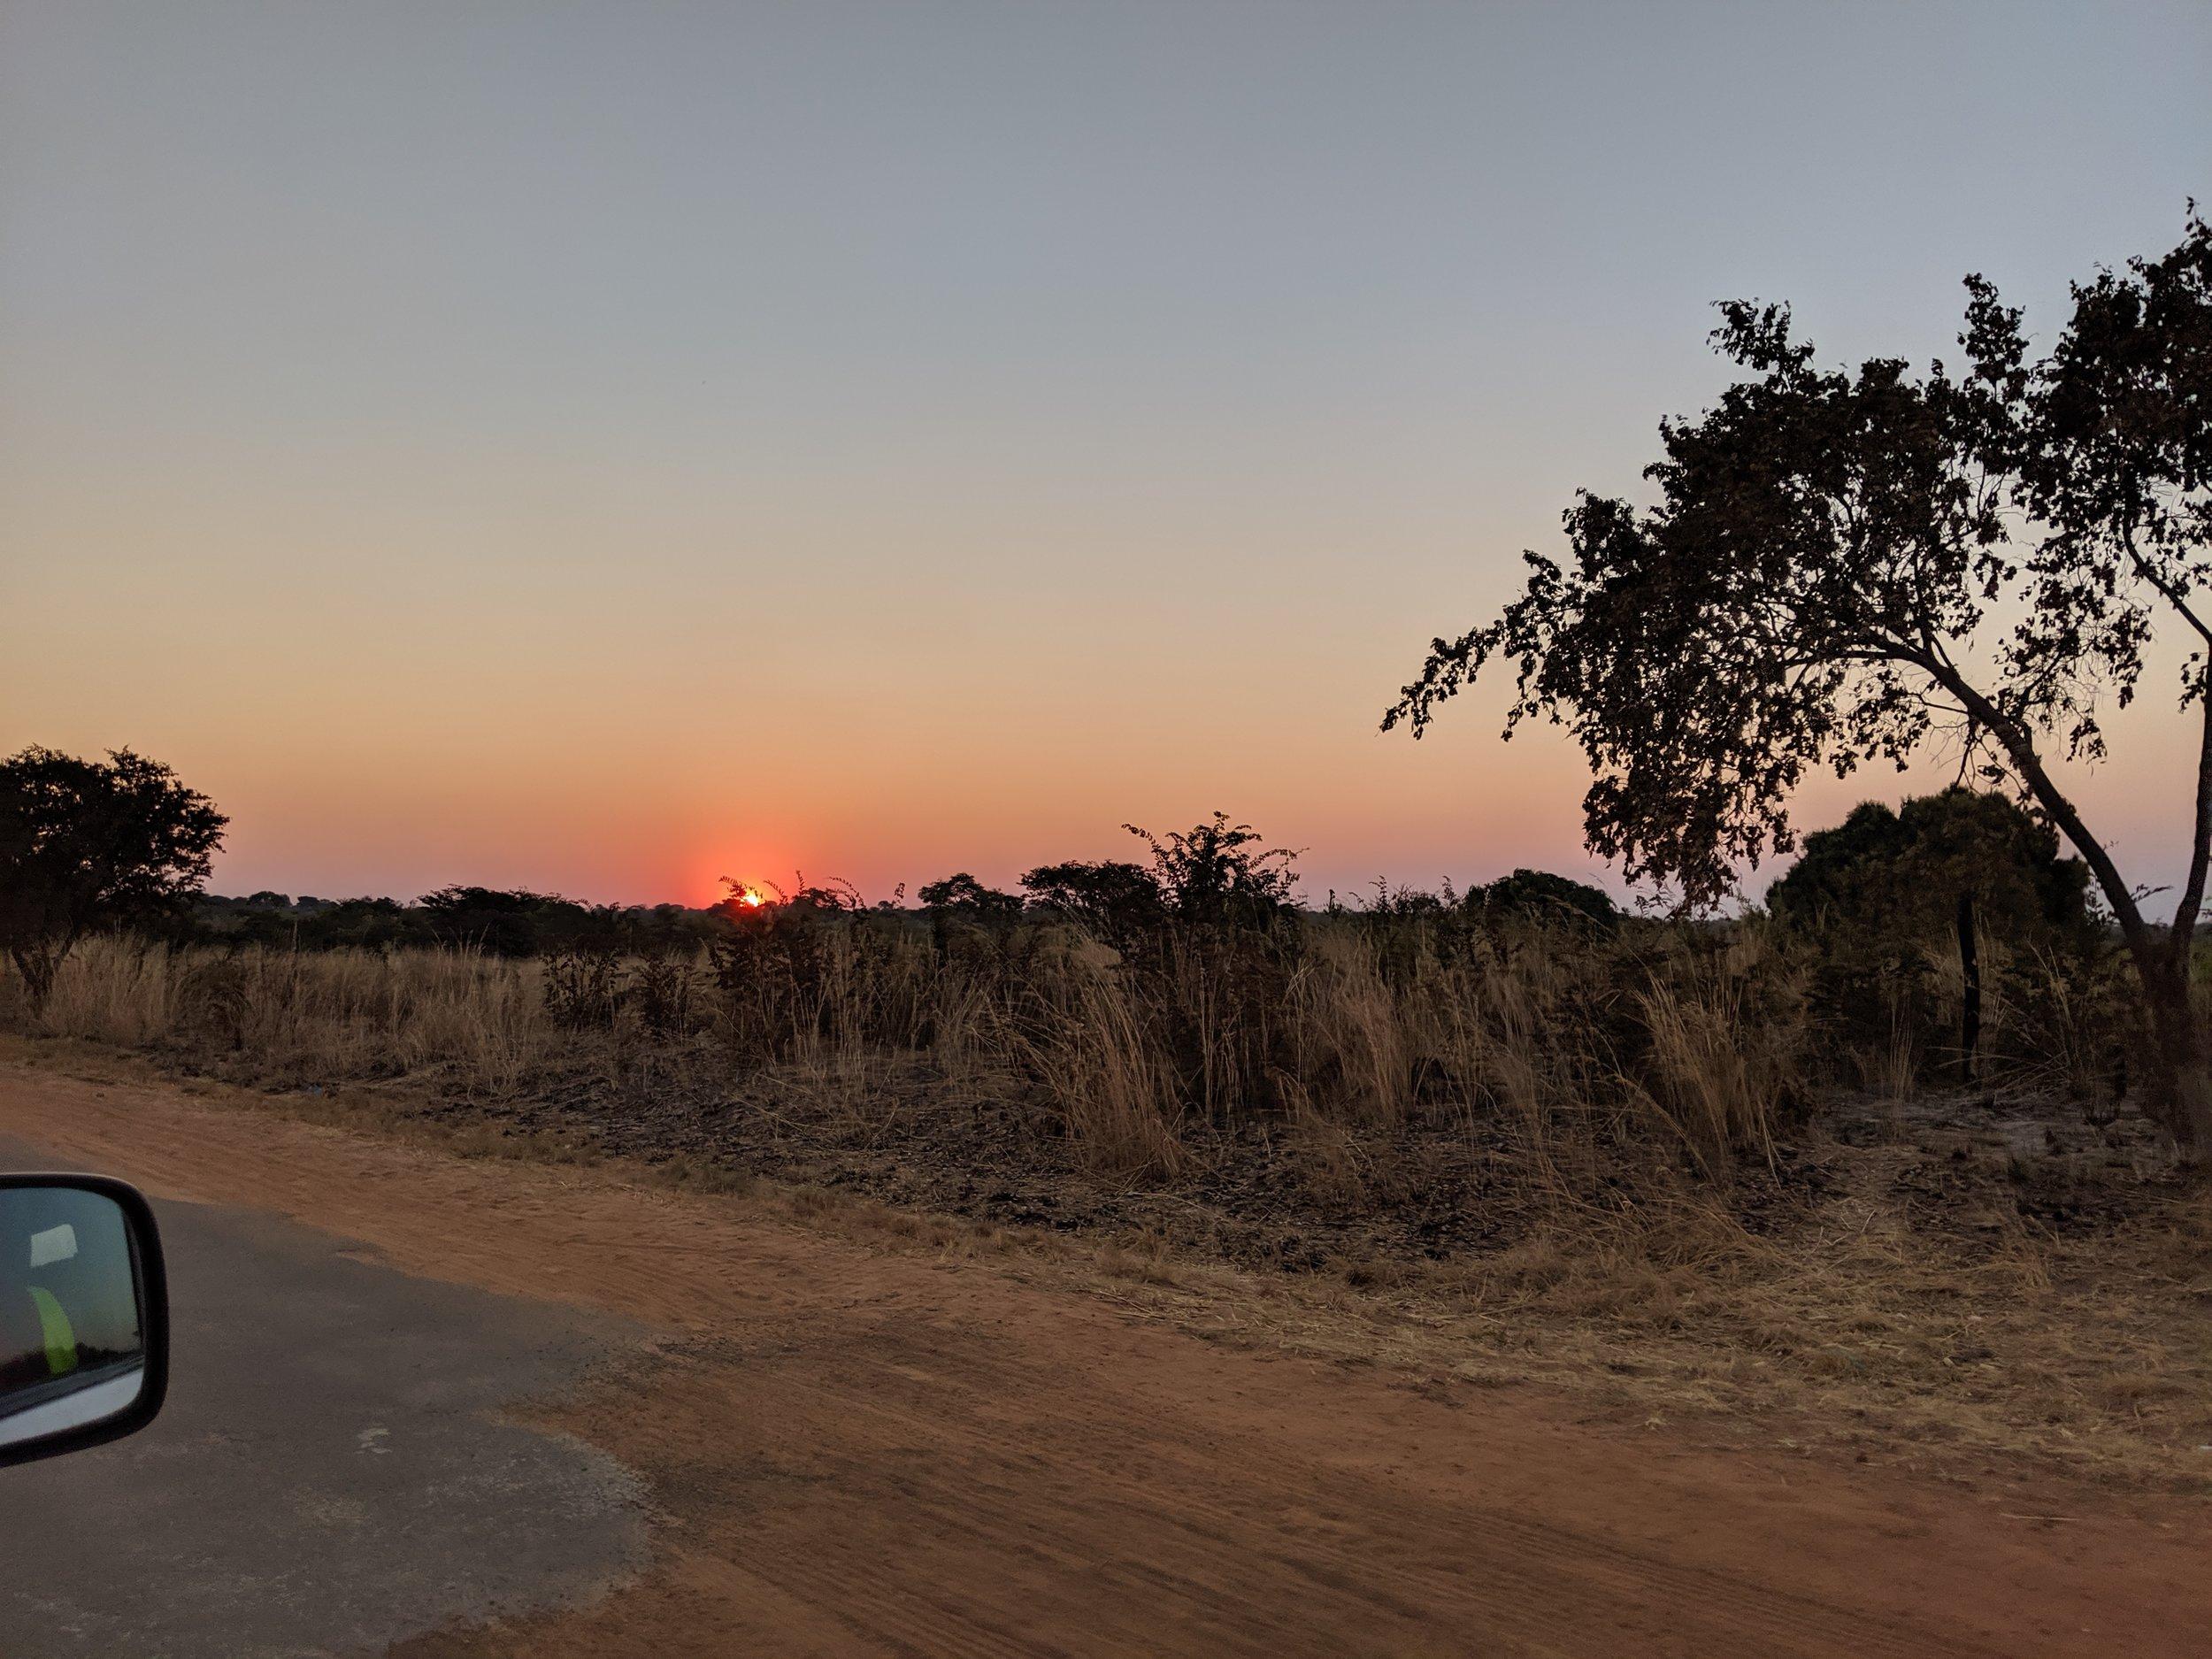 Sunset on the road to Shamiyoyo